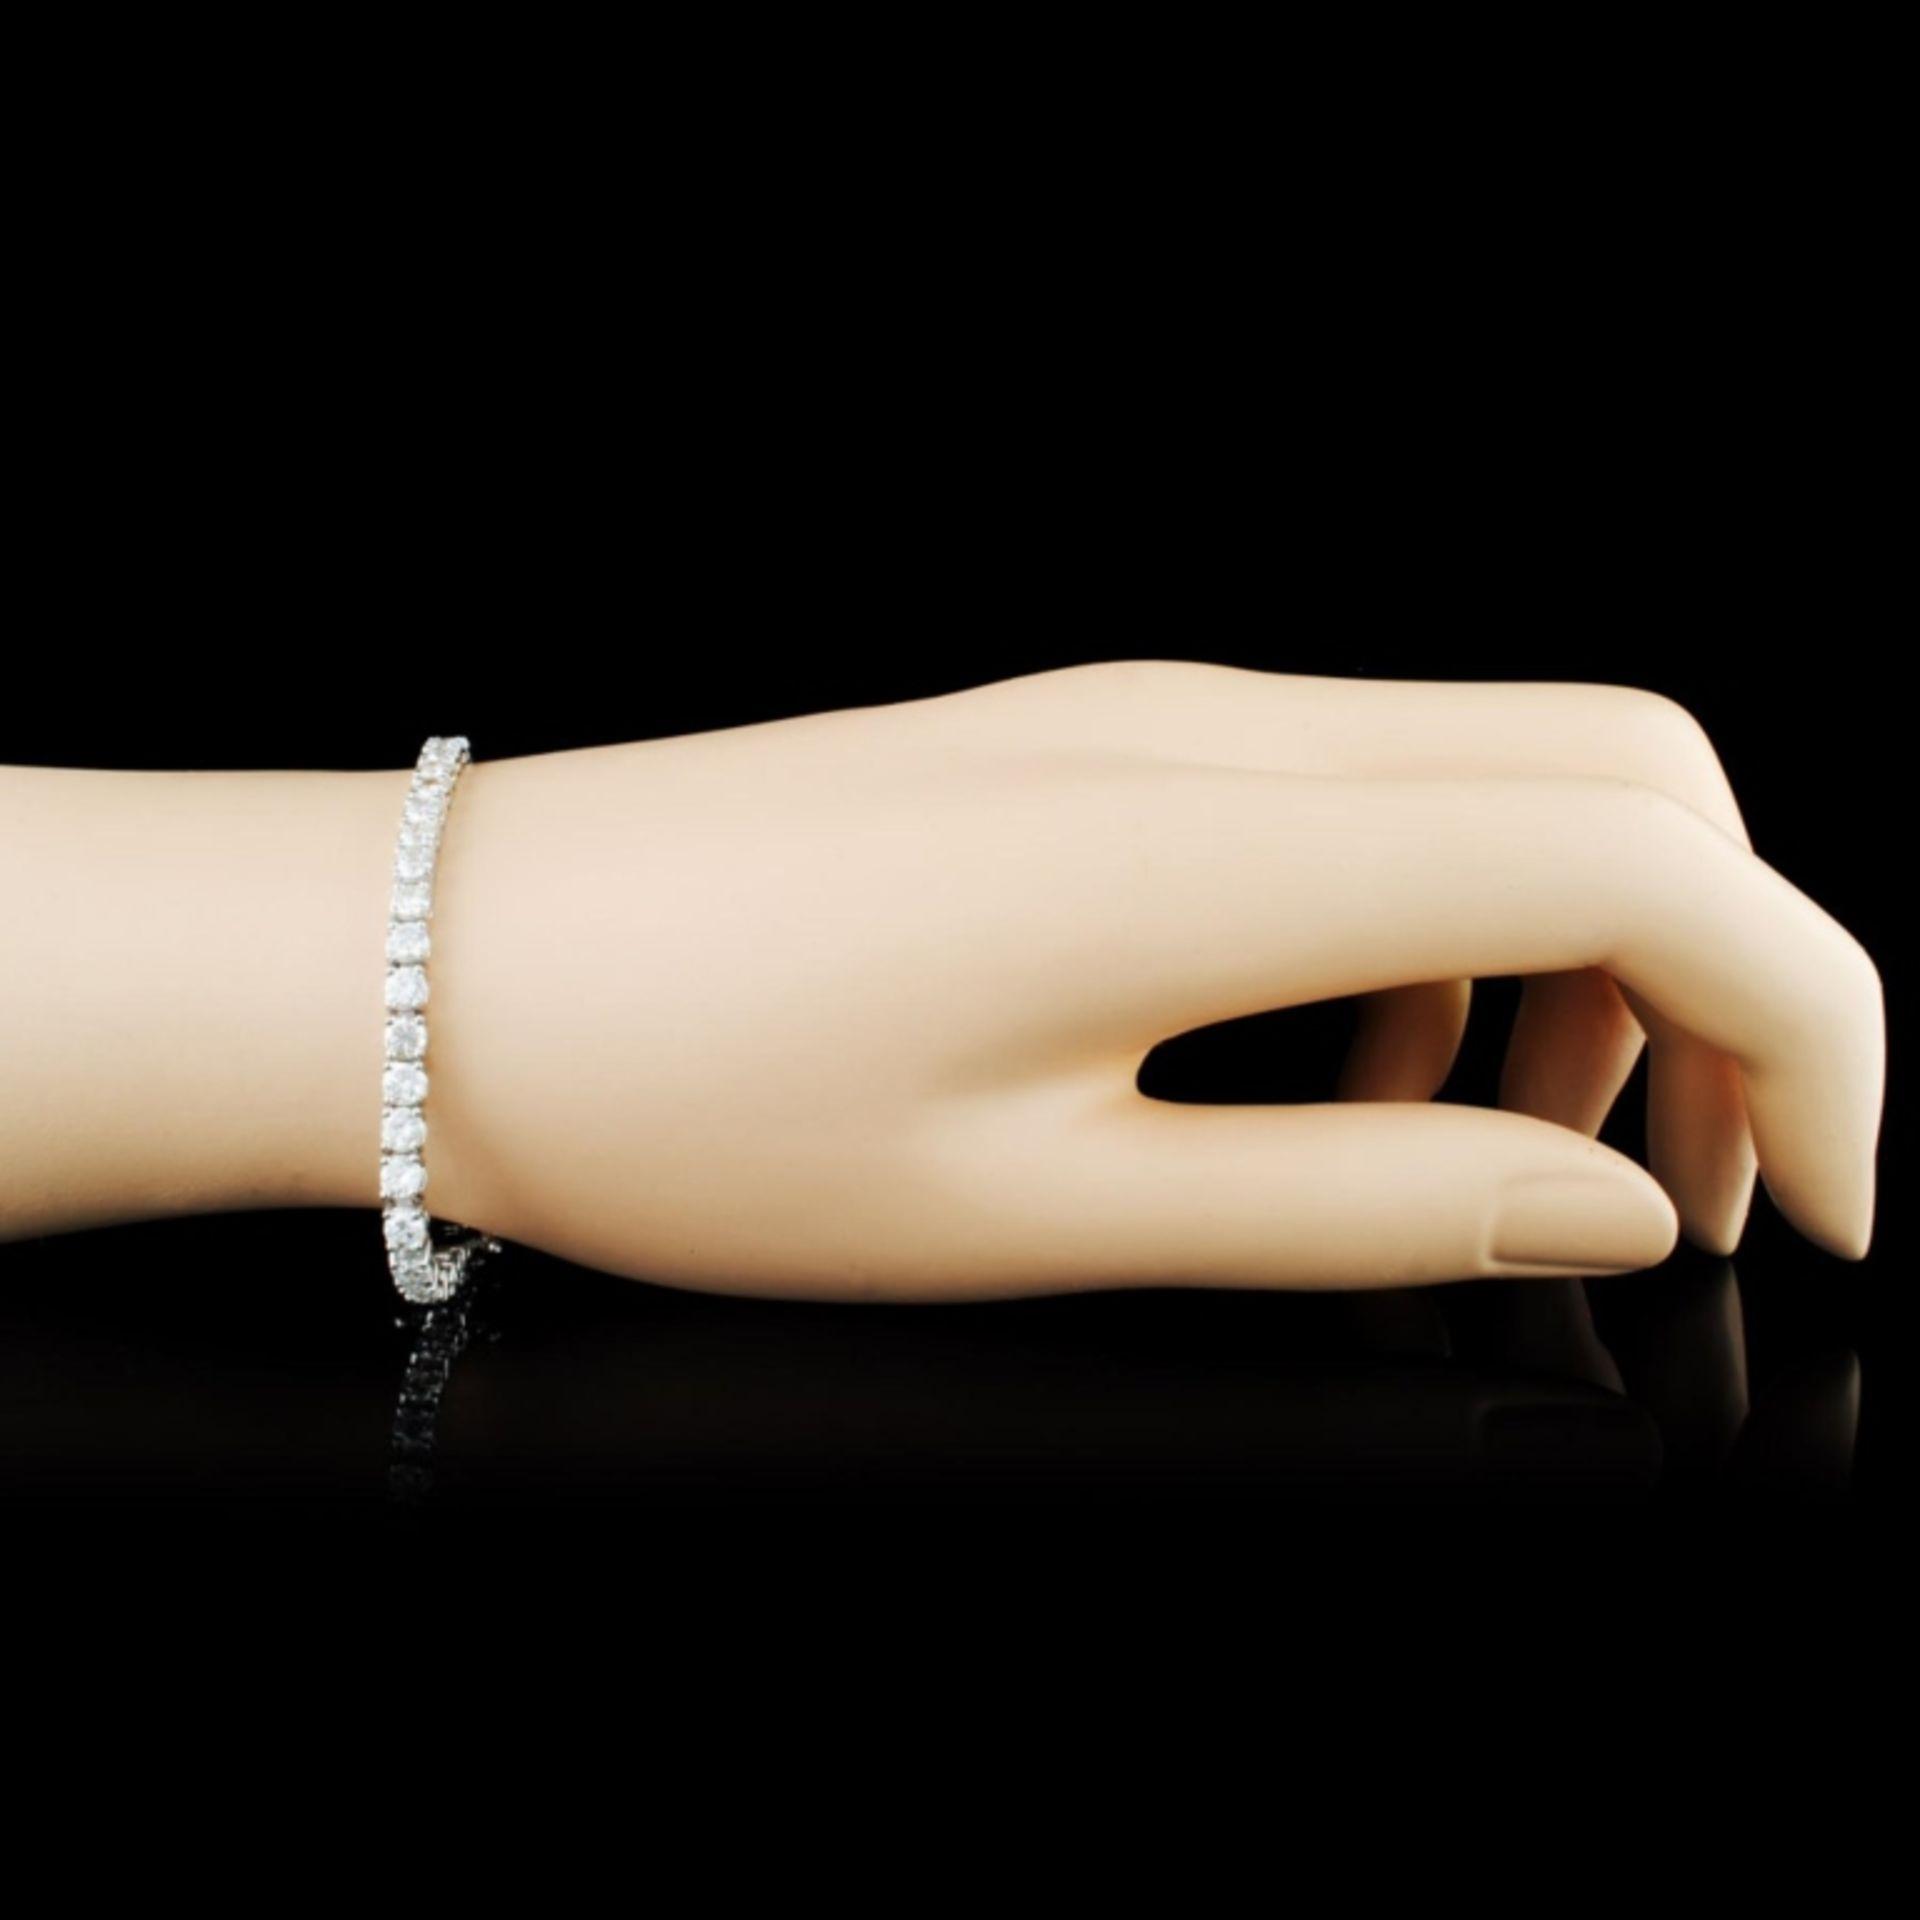 14K Gold 7.59ctw Diamond Bracelet - Image 3 of 4